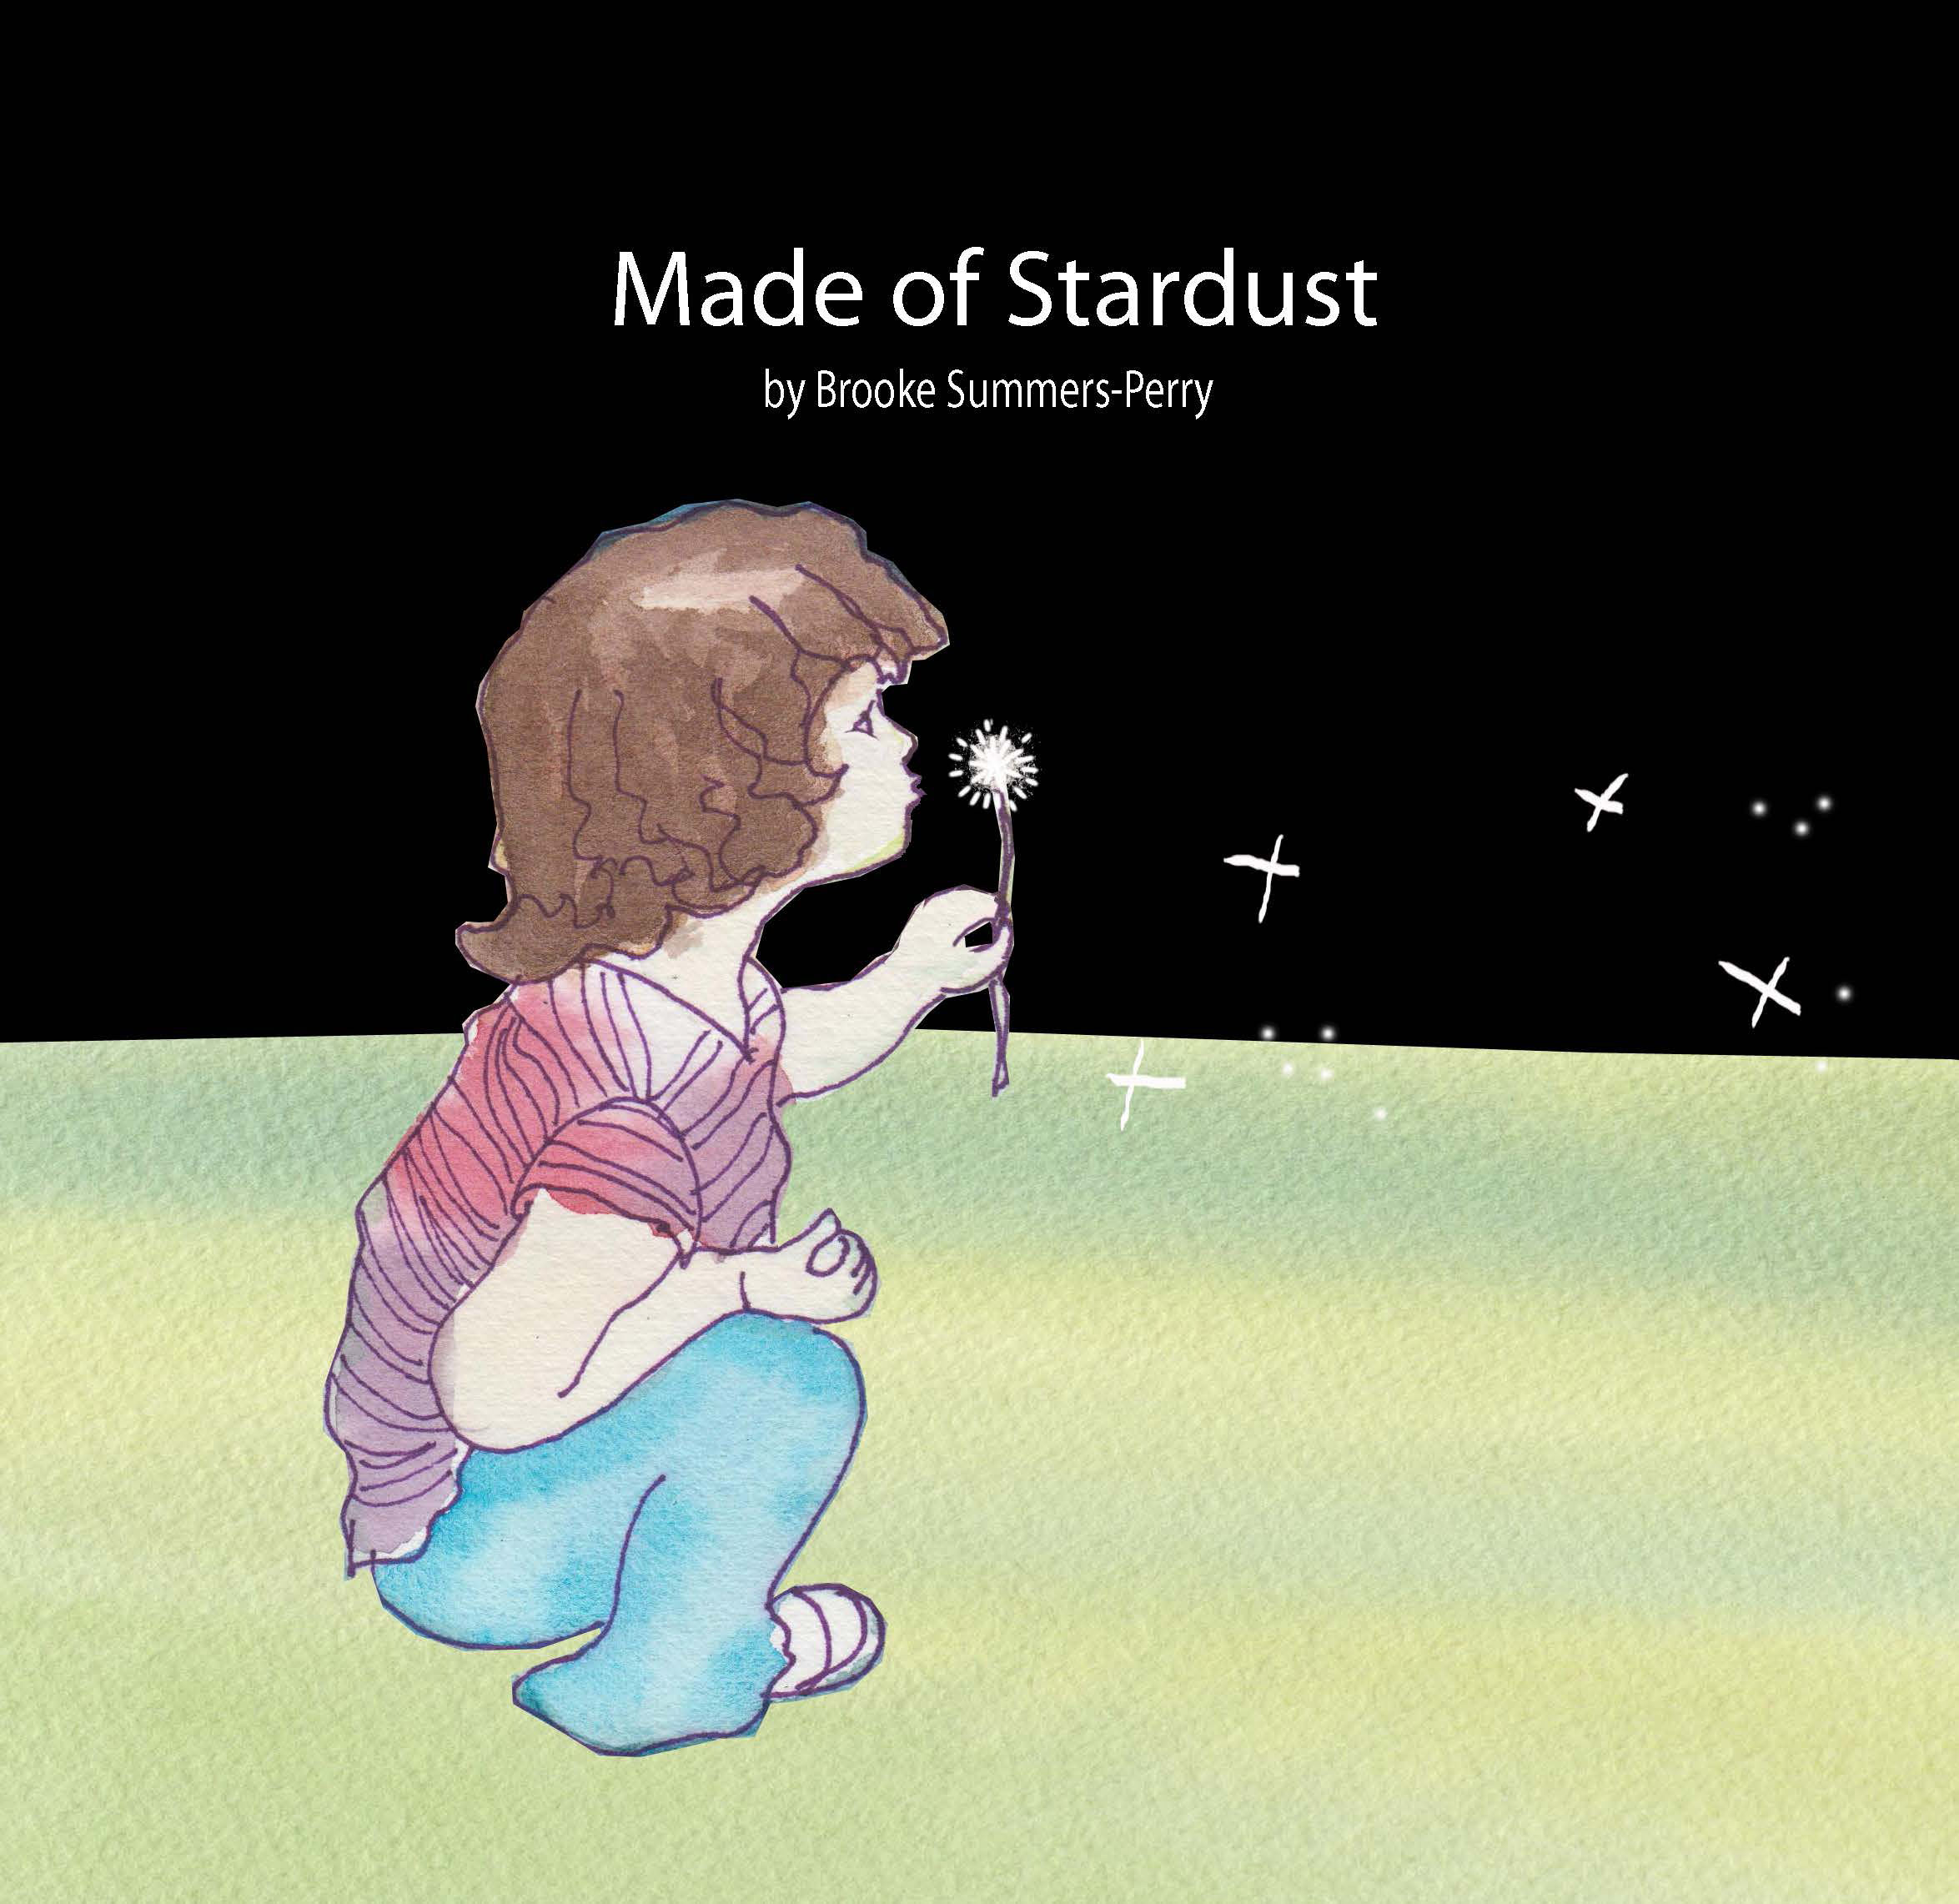 madeofstardust.jpg